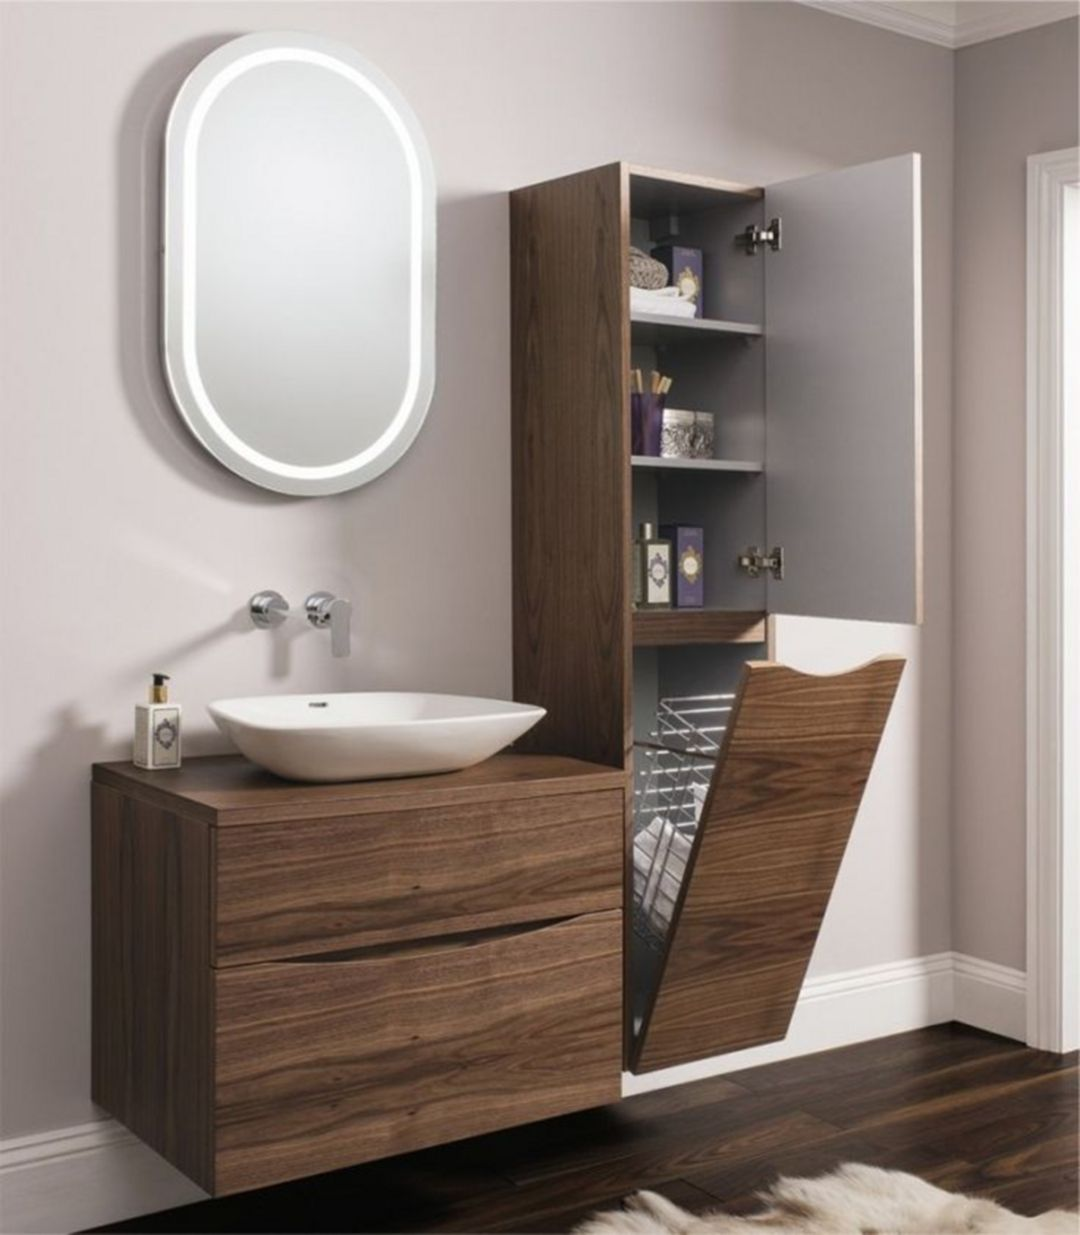 20 unique furniture design ideas to amaze your home for Gabinete de almacenamiento de bano de madera